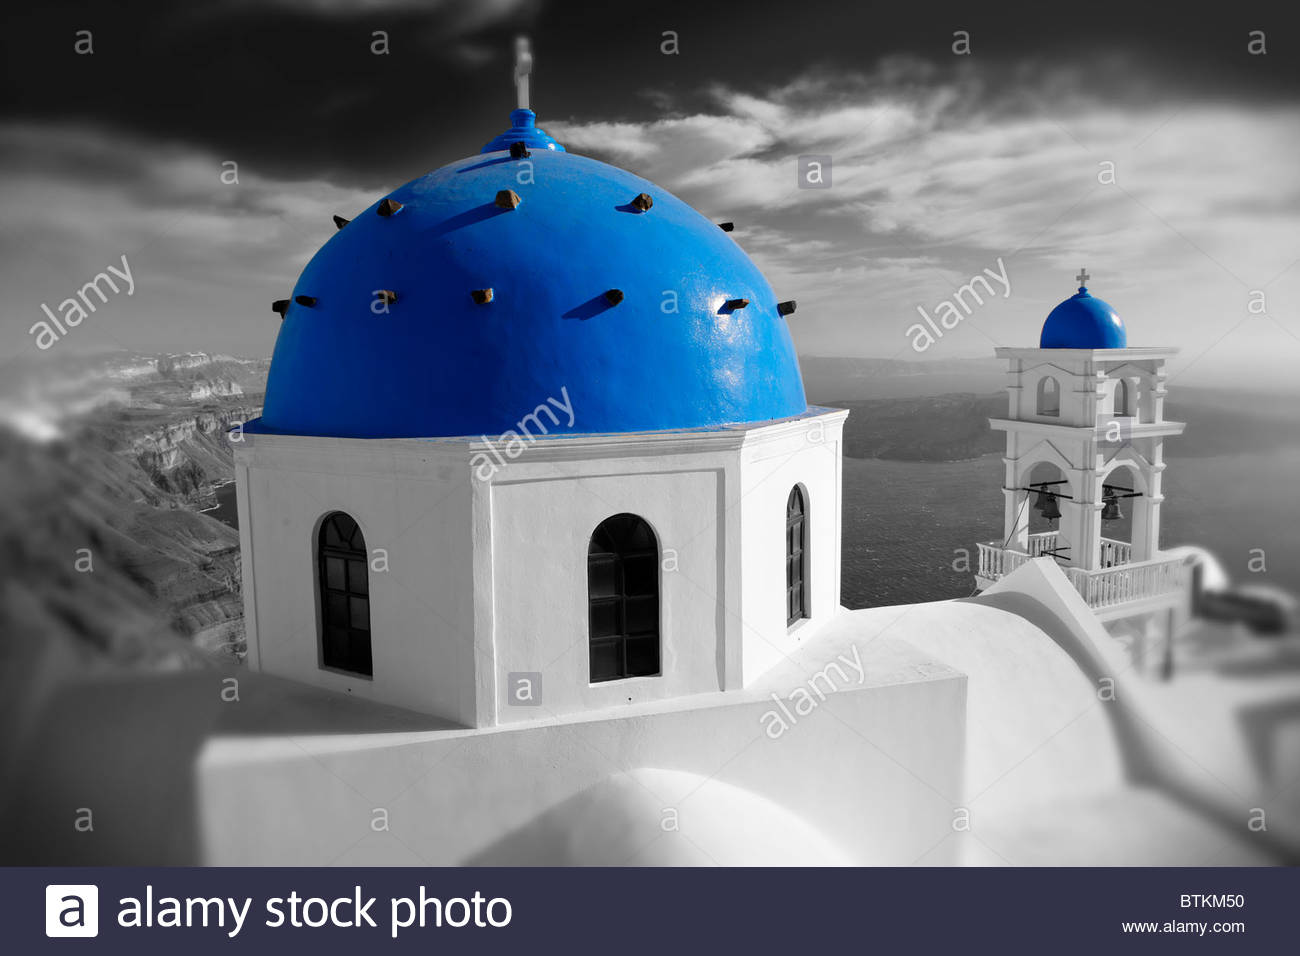 Selective colour photo of a traditional blue Domed church of Imerovigli looking across the sea, Santorini, Greece - Stock Image